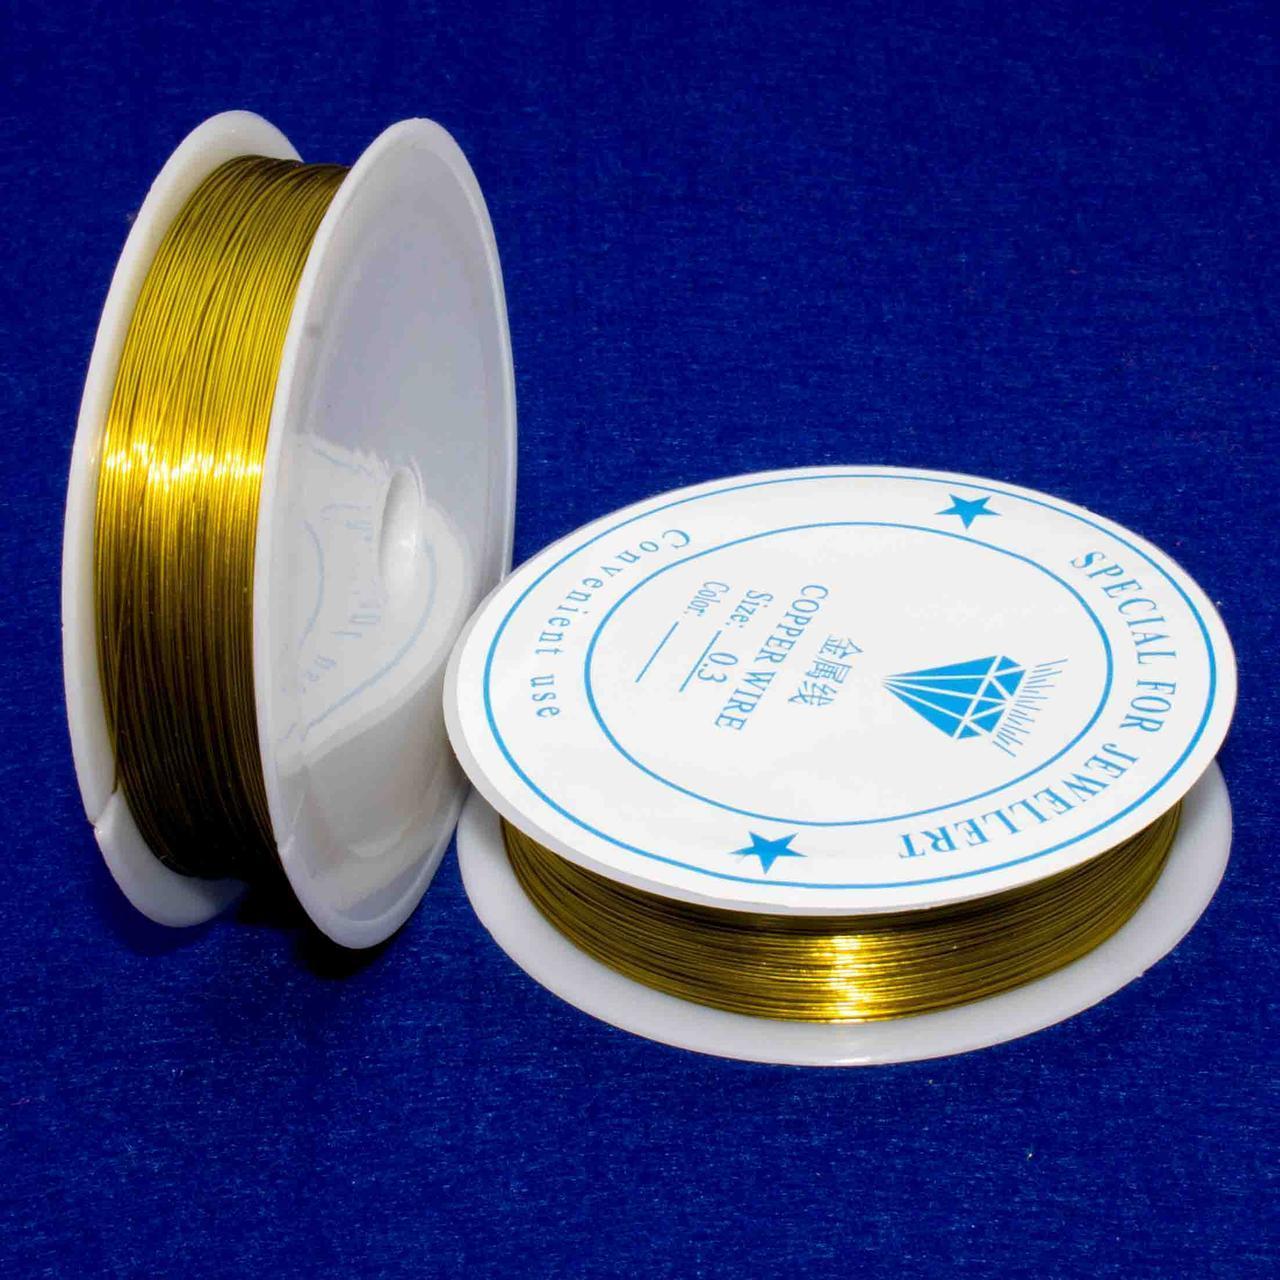 Проволока 0,3мм Намотка 50 ярдов(46 метров), цвет - золото